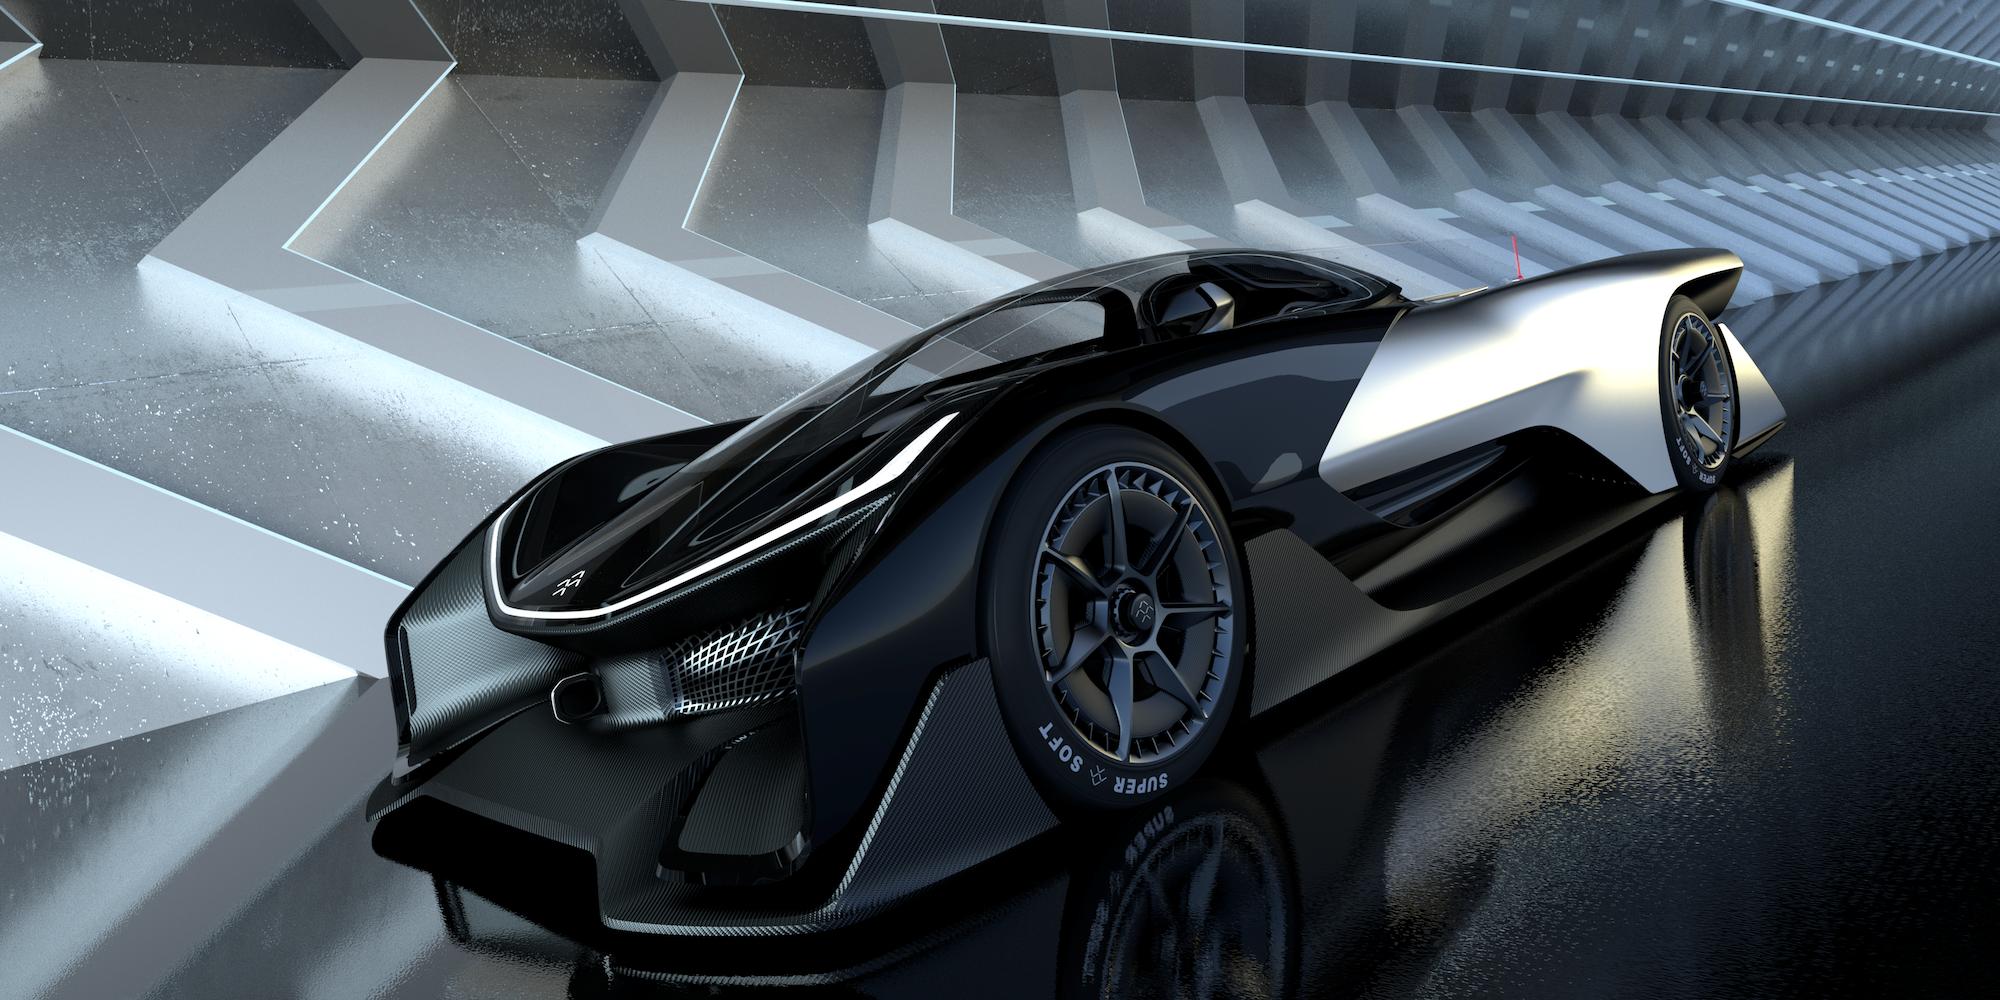 Faraday Future announced a partnership with LG Chem.